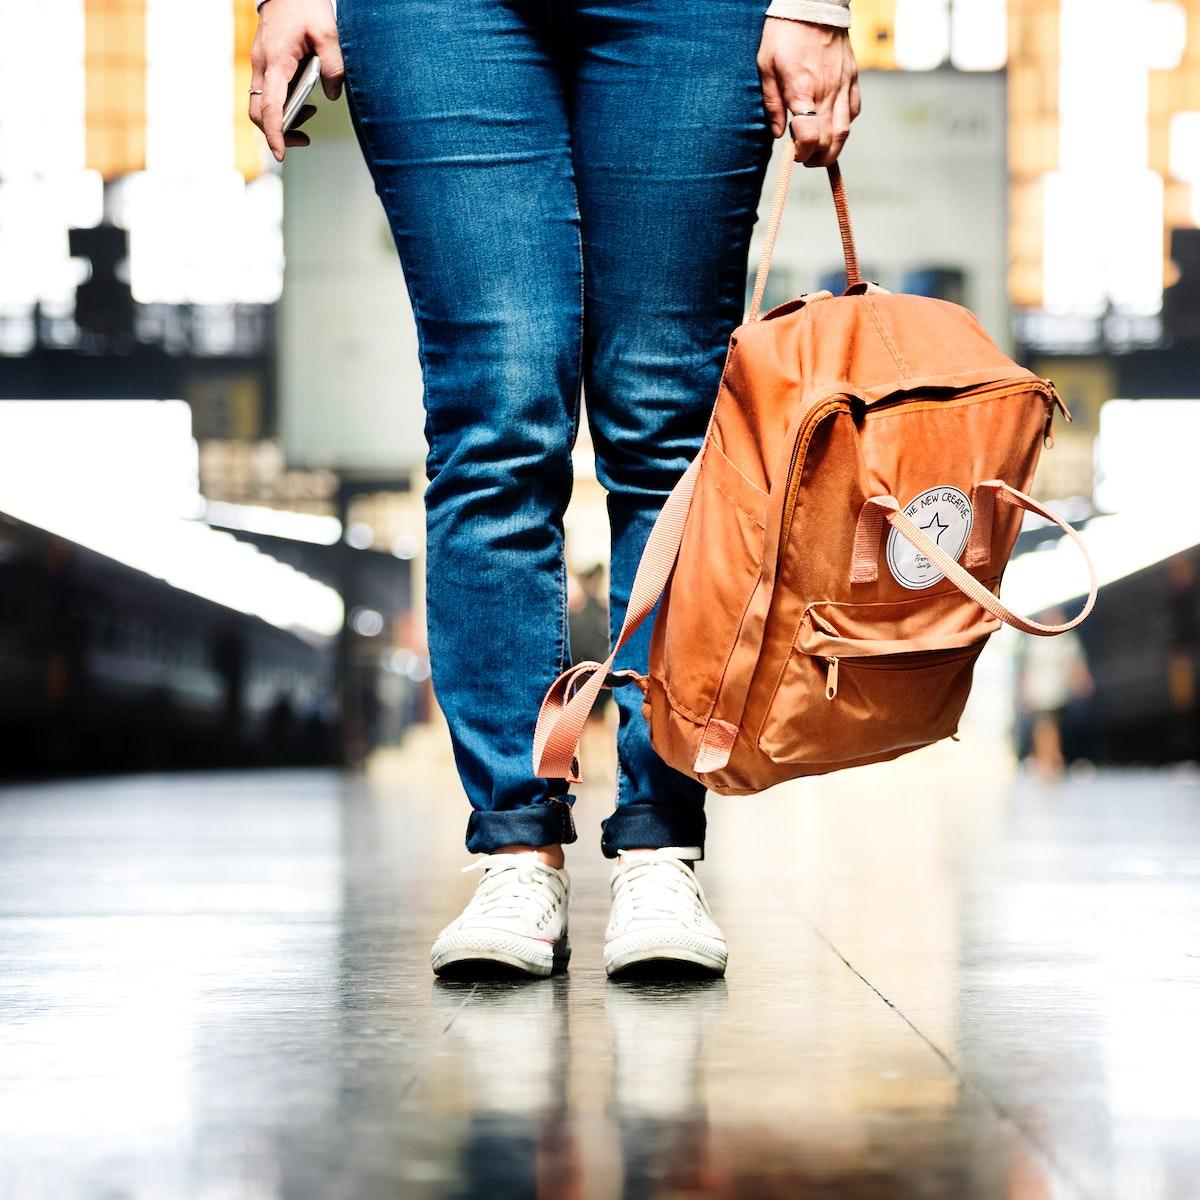 Asian woman carrying a bag